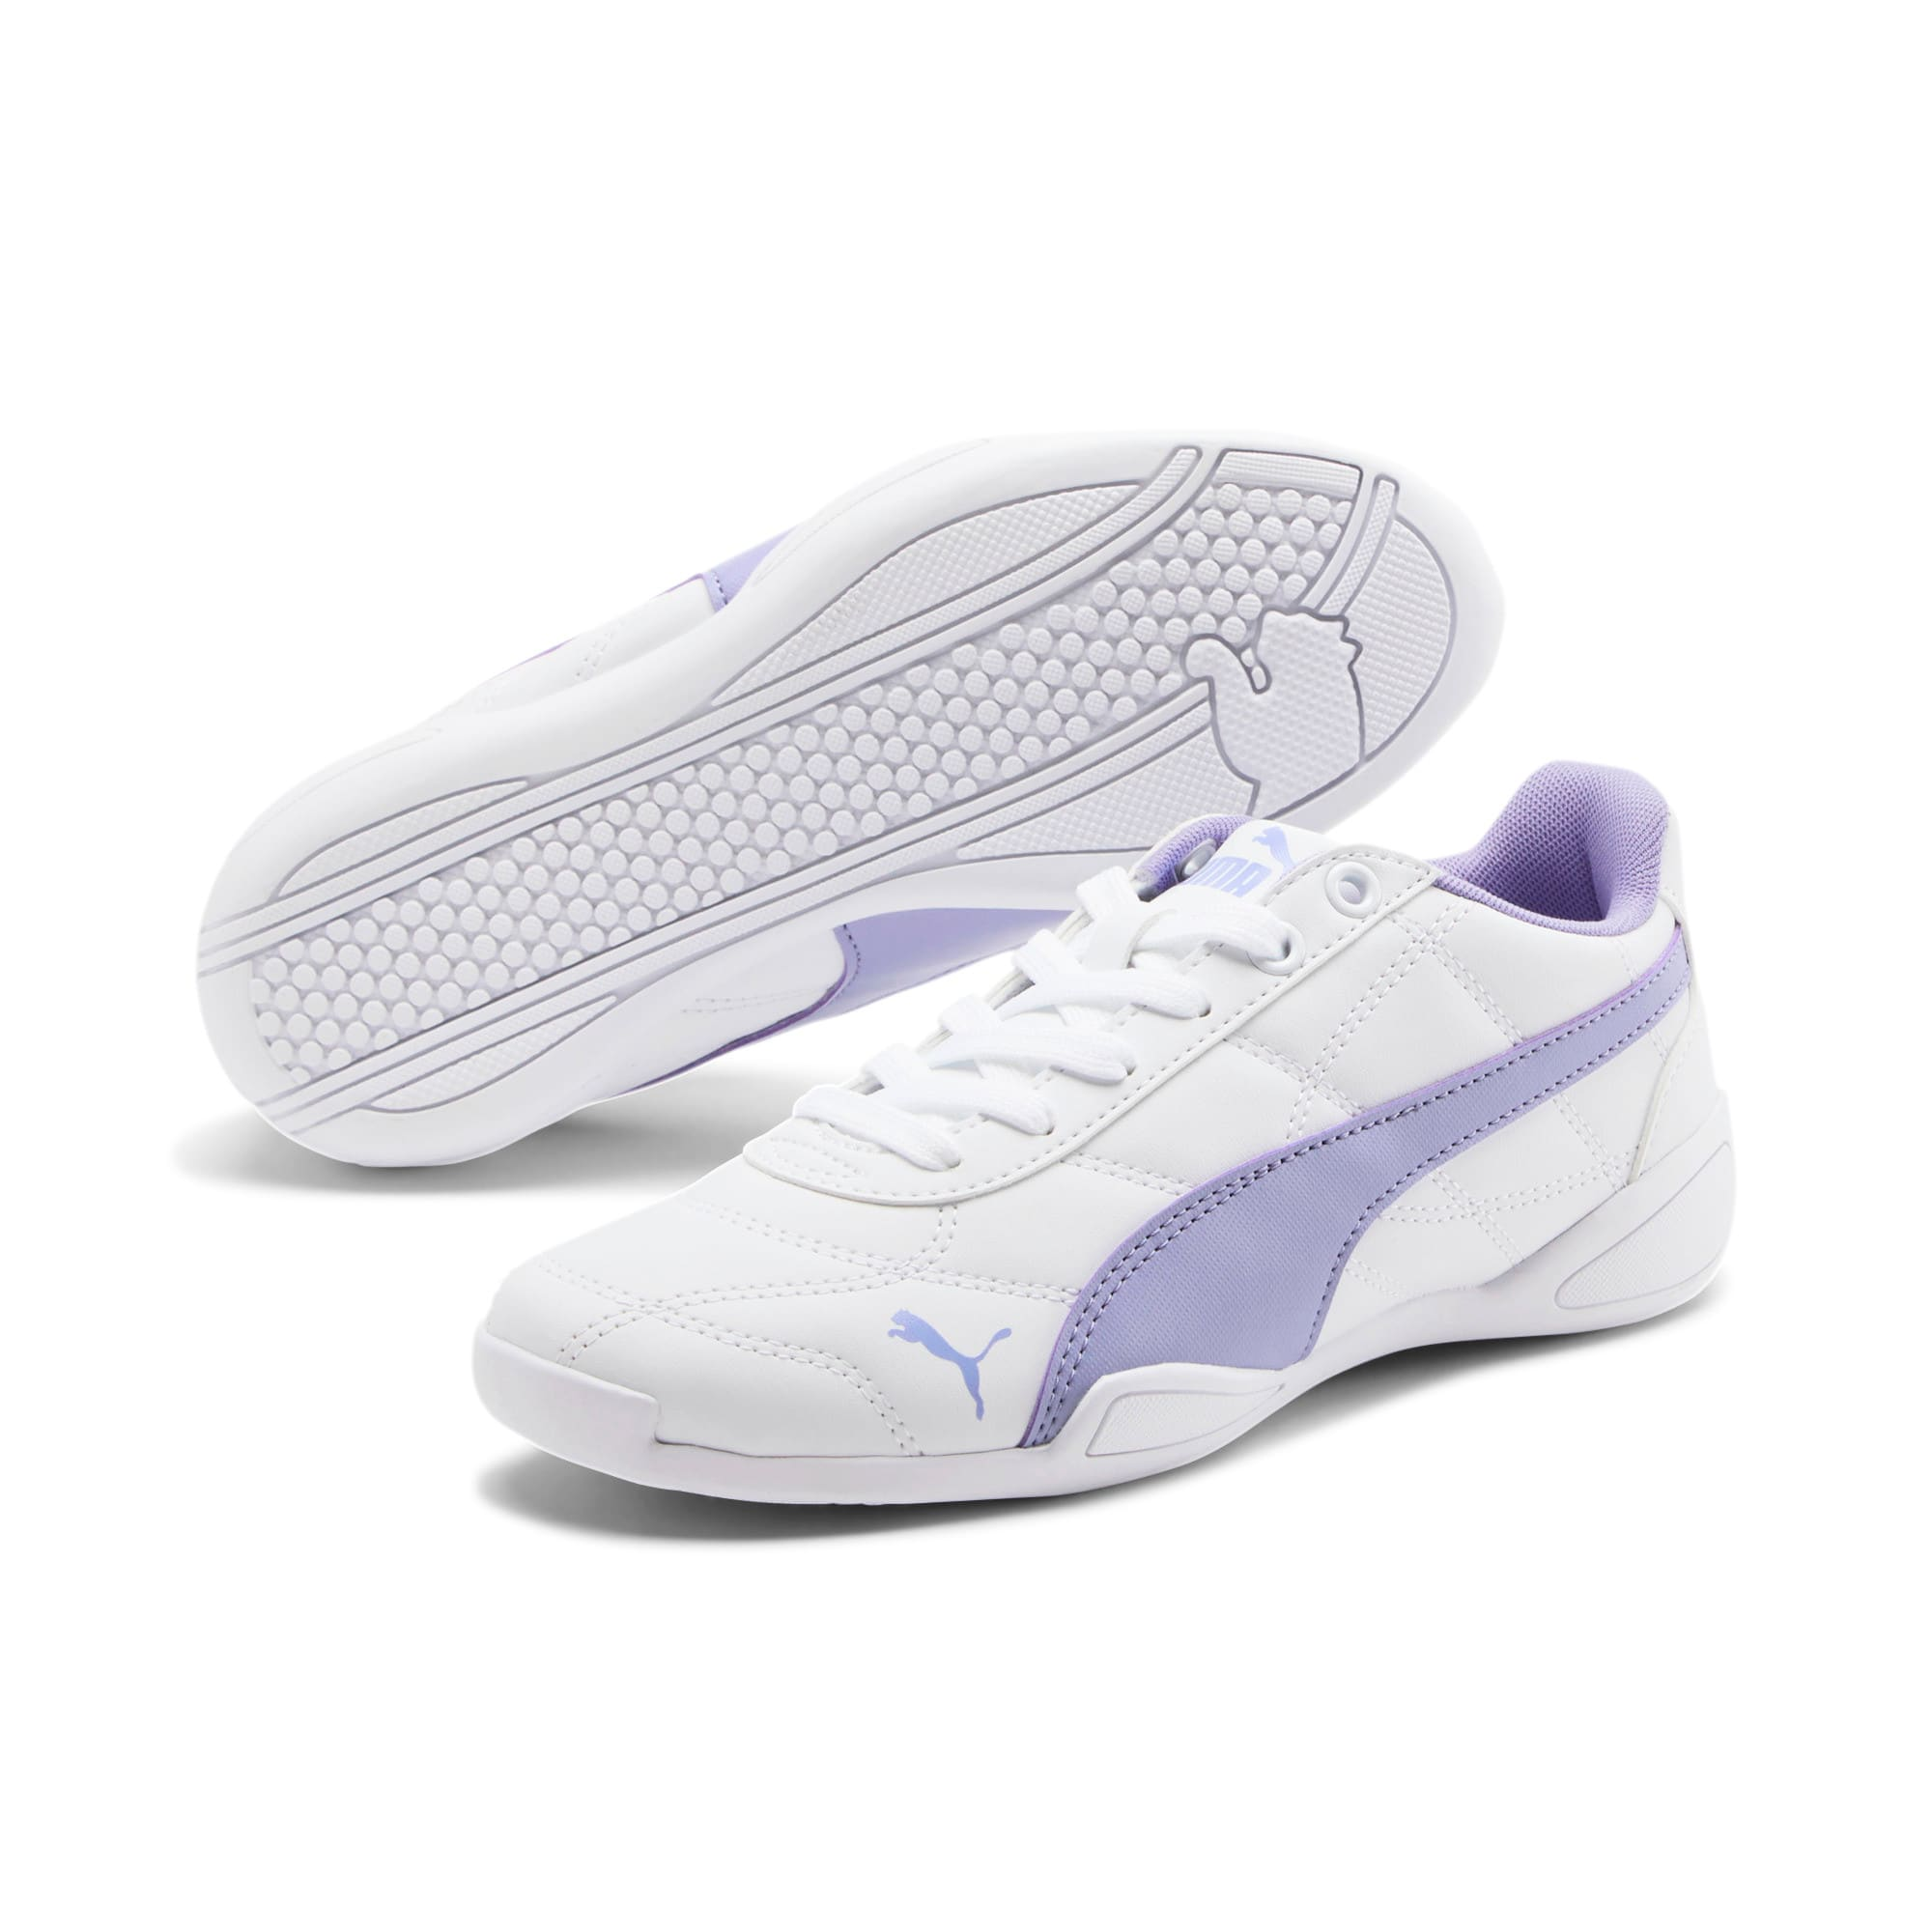 Miniatura 2 de ZapatosTune Cat 3para junior, Puma White-Sweet Lavender, mediano